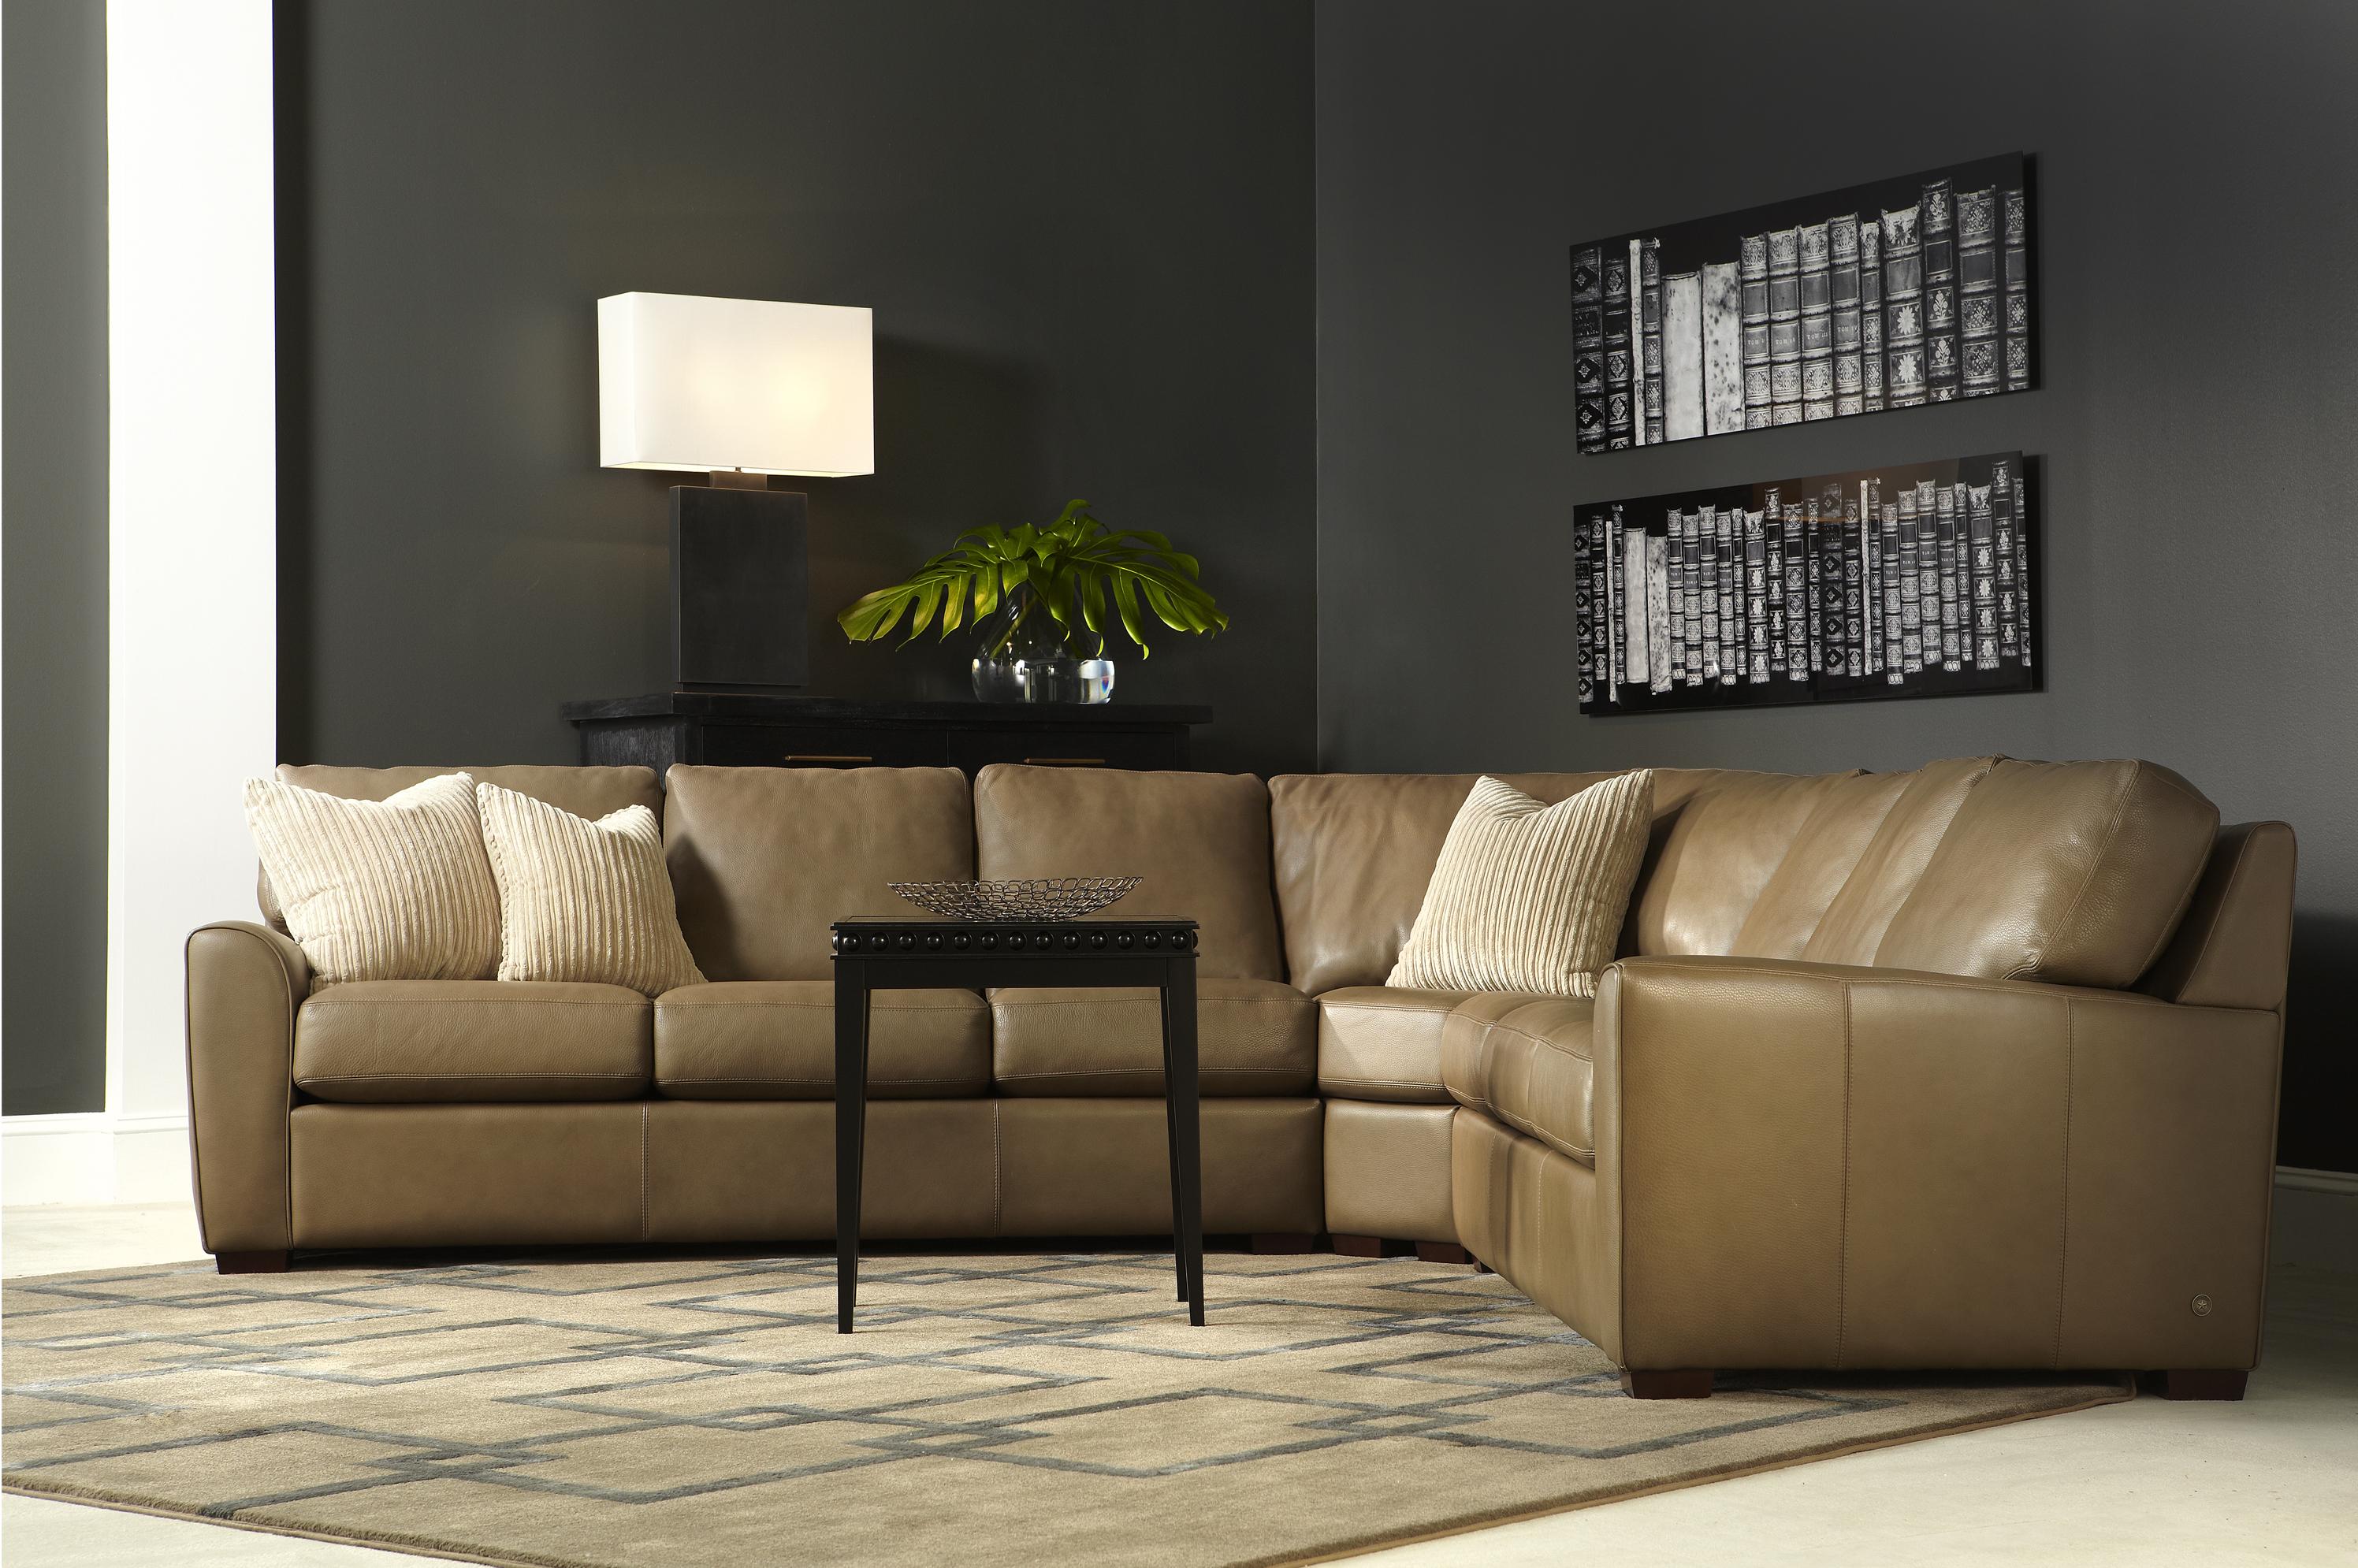 sectional sofas nyc showroom sofar sounds kaden design depot furniture miami gallery image